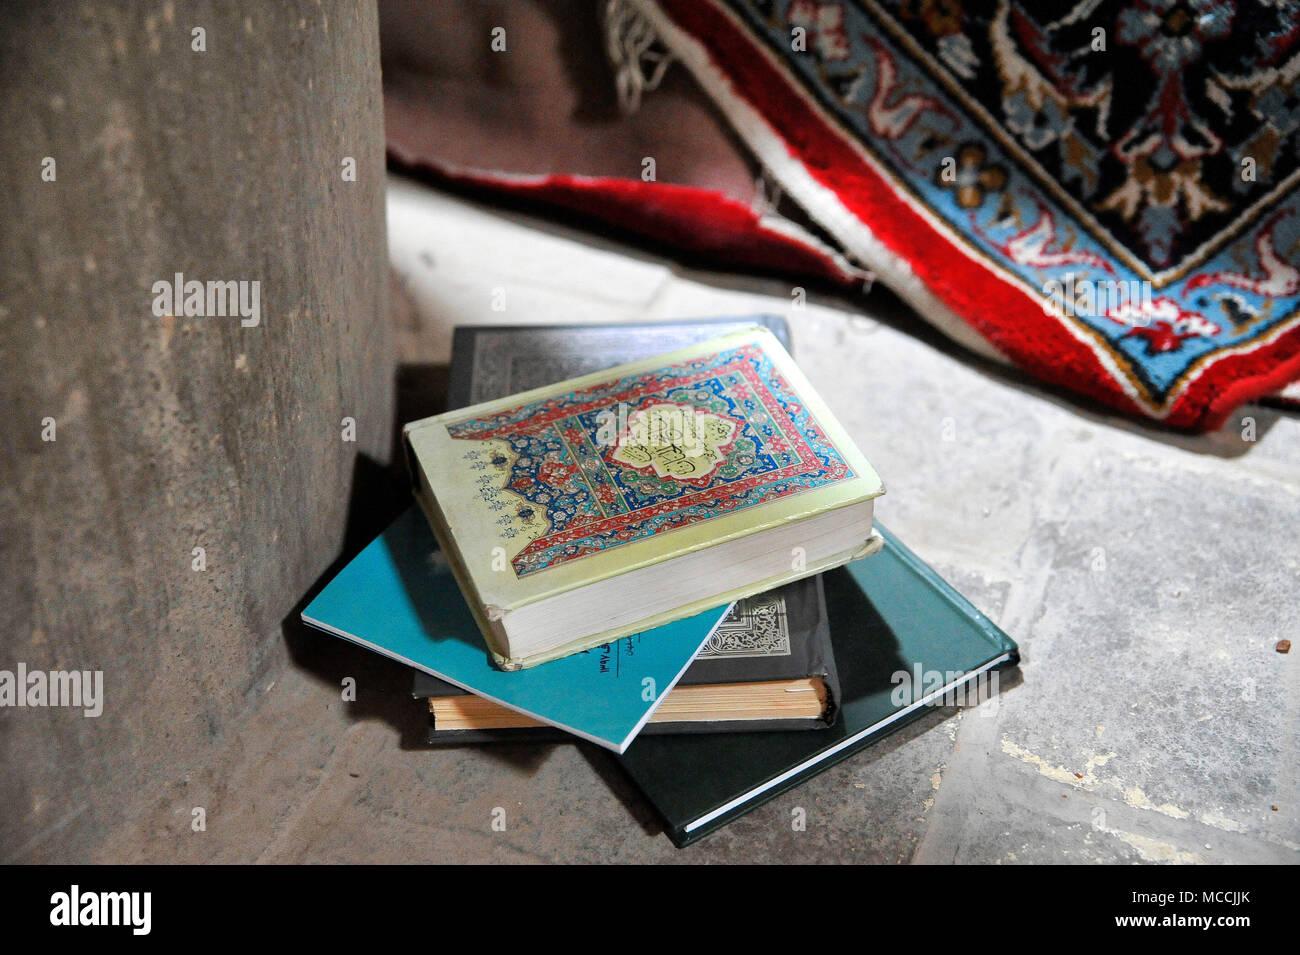 Koran at Majed-e Emam, Imam Mosque, Isfahan, Iran - internal setting - Stock Image